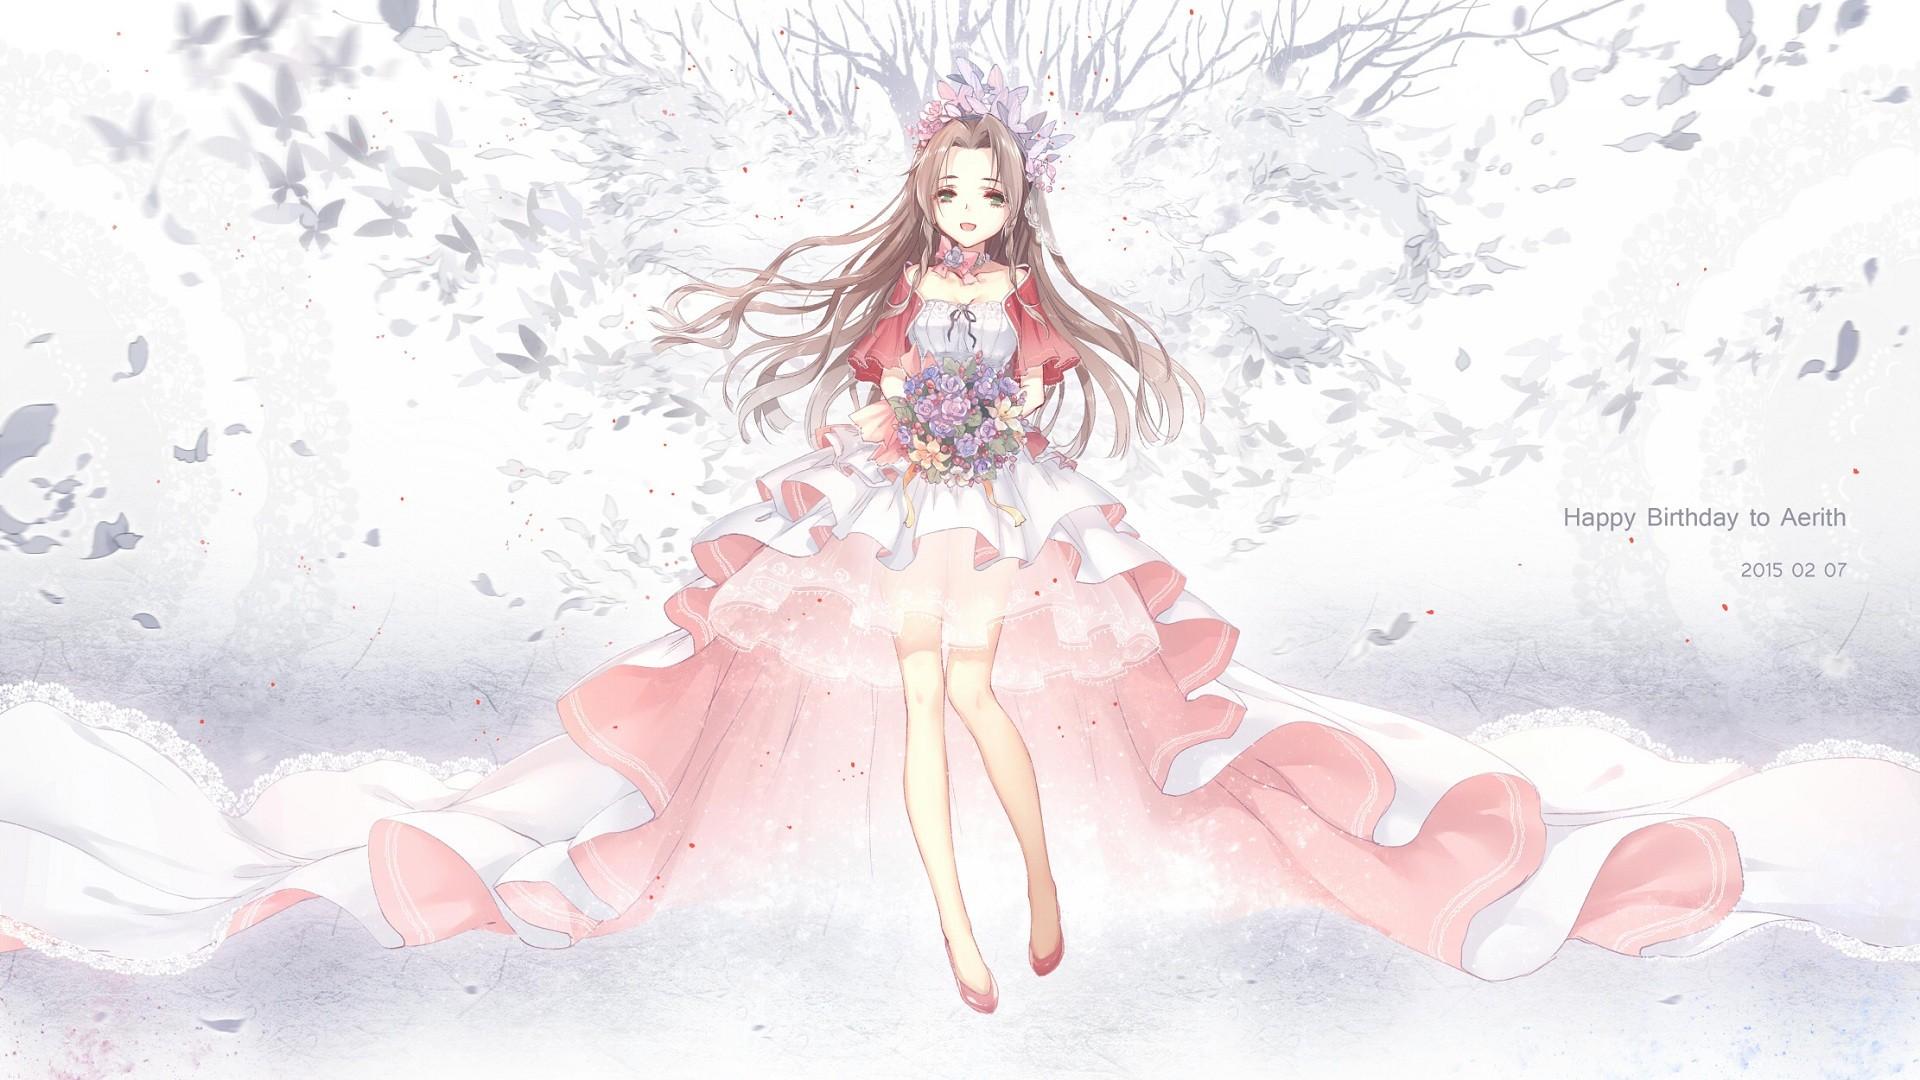 Anime 1920x1080 anime anime girls Final Fantasy VII Aerith Gainsborough